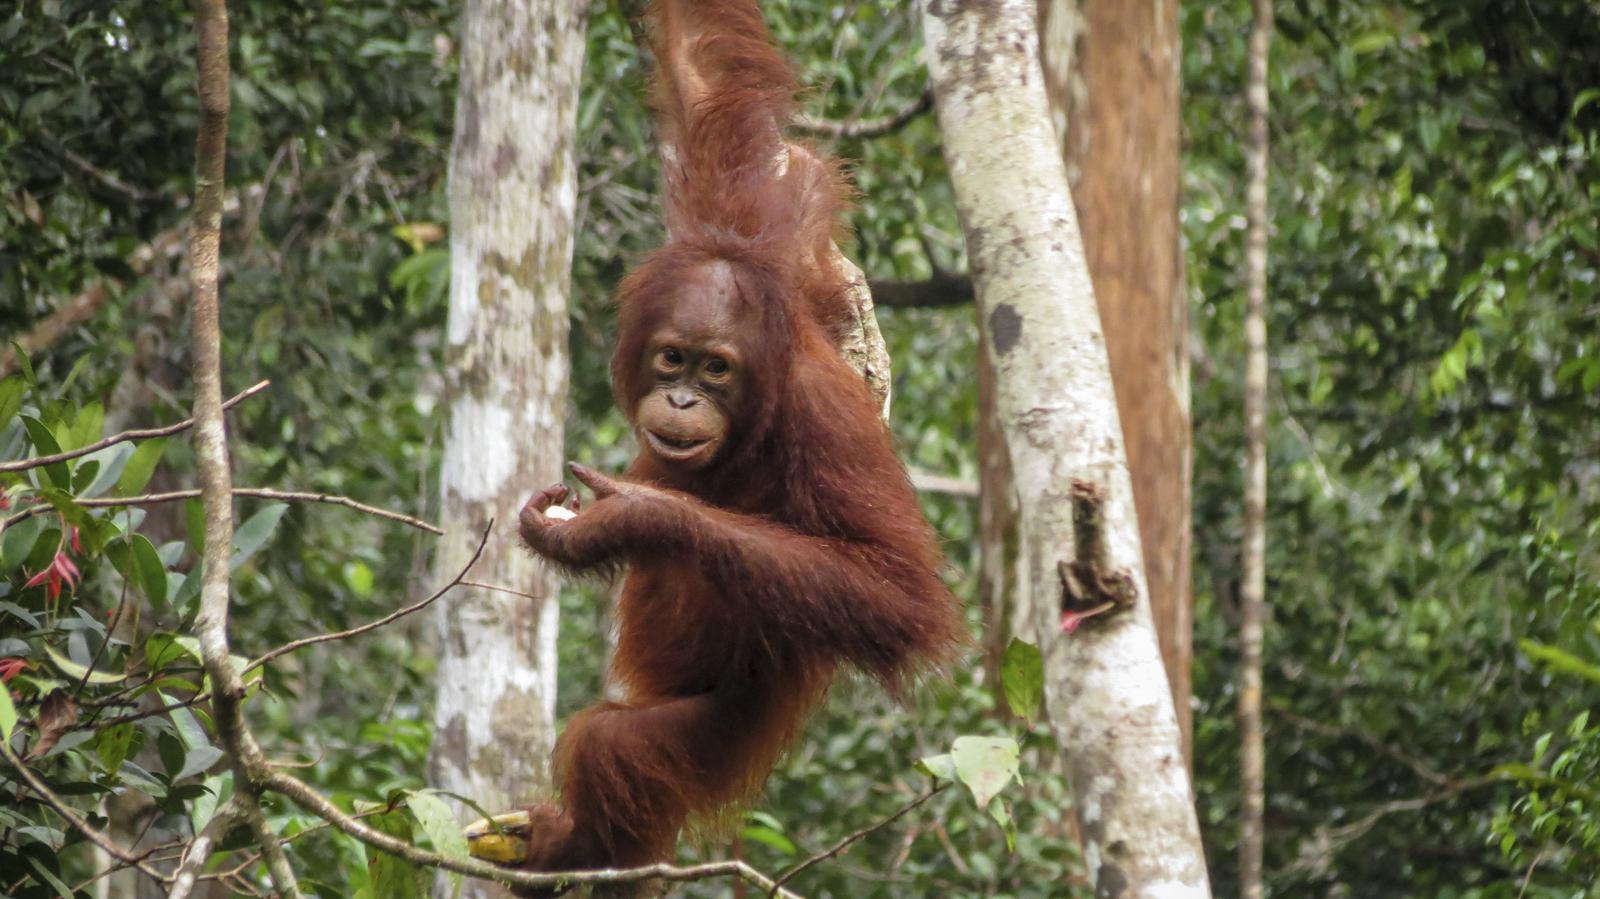 An orangutan in Tanjung Puting National Park in Borneo, Indonesia. Photo credit: © Katie Hawk